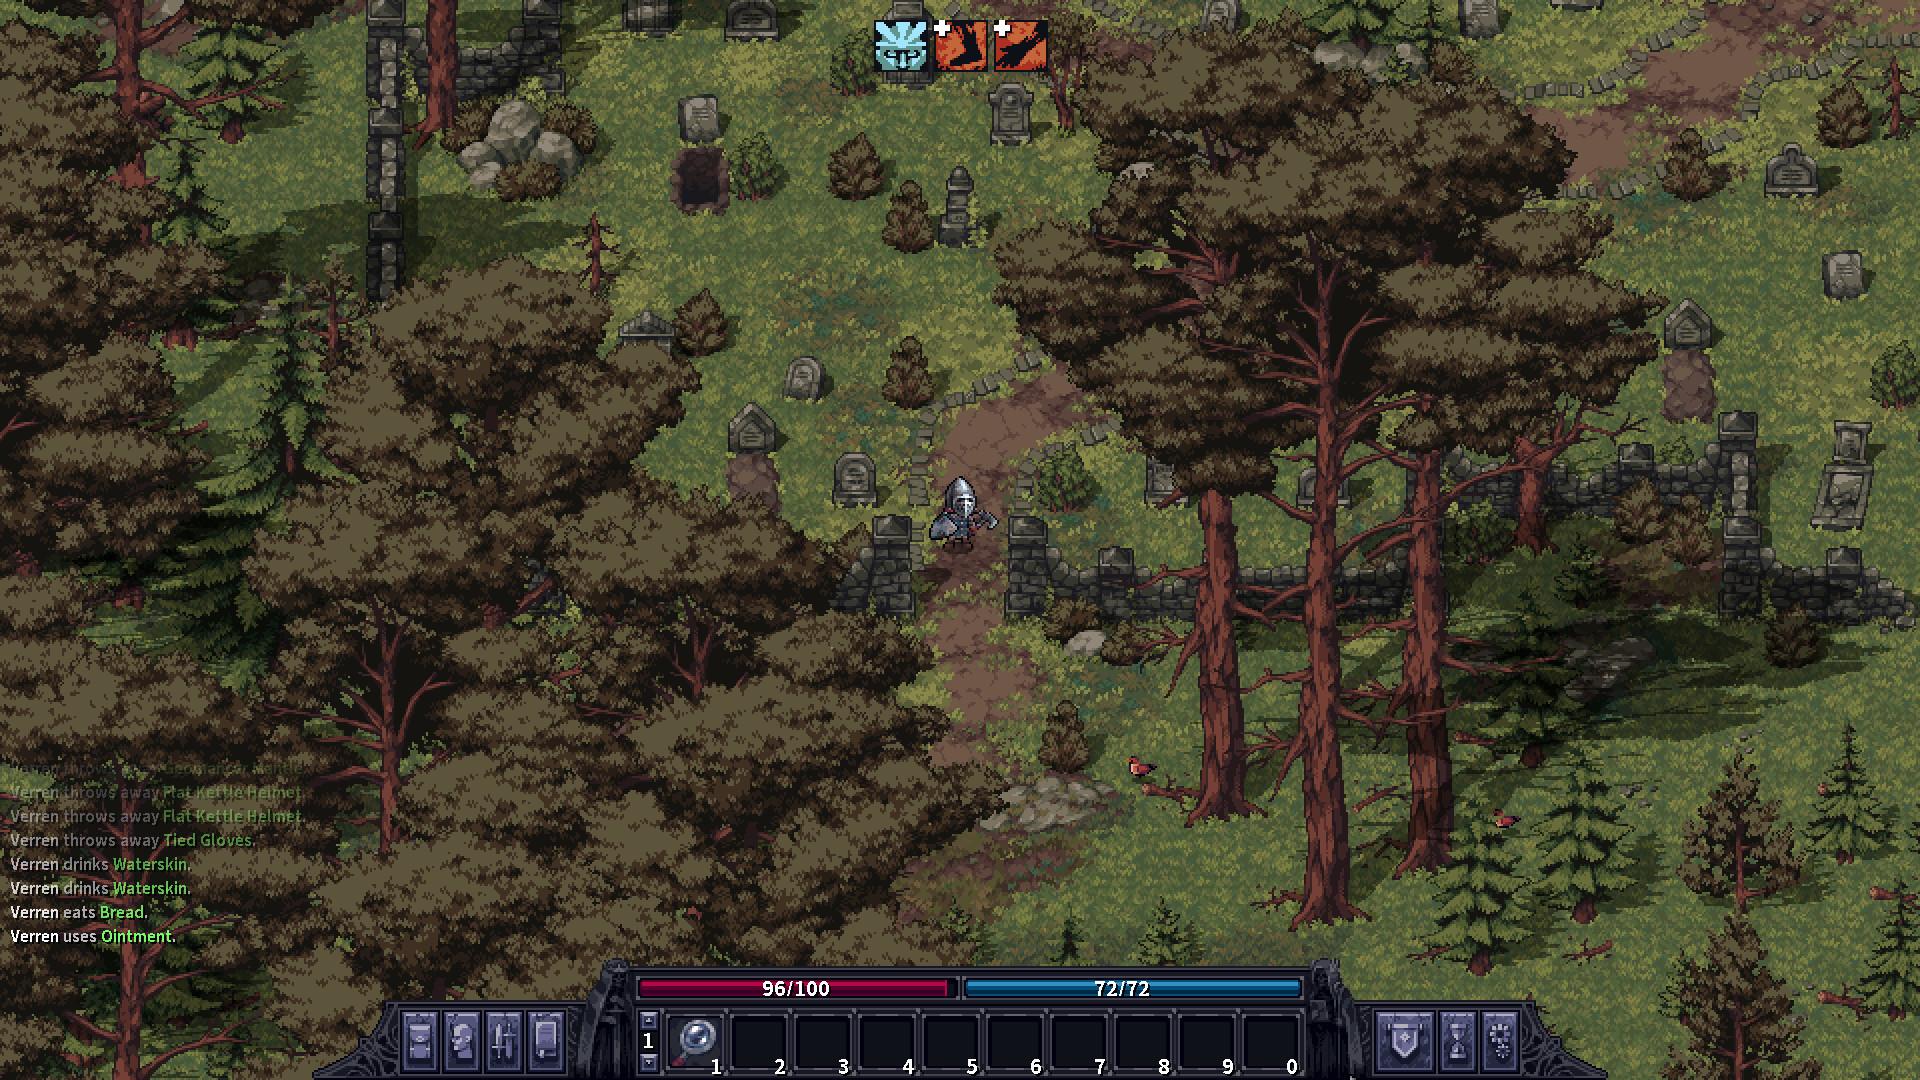 IsnF1MRW uJSh6pMQvi glRSv78 | RPG Jeuxvidéo